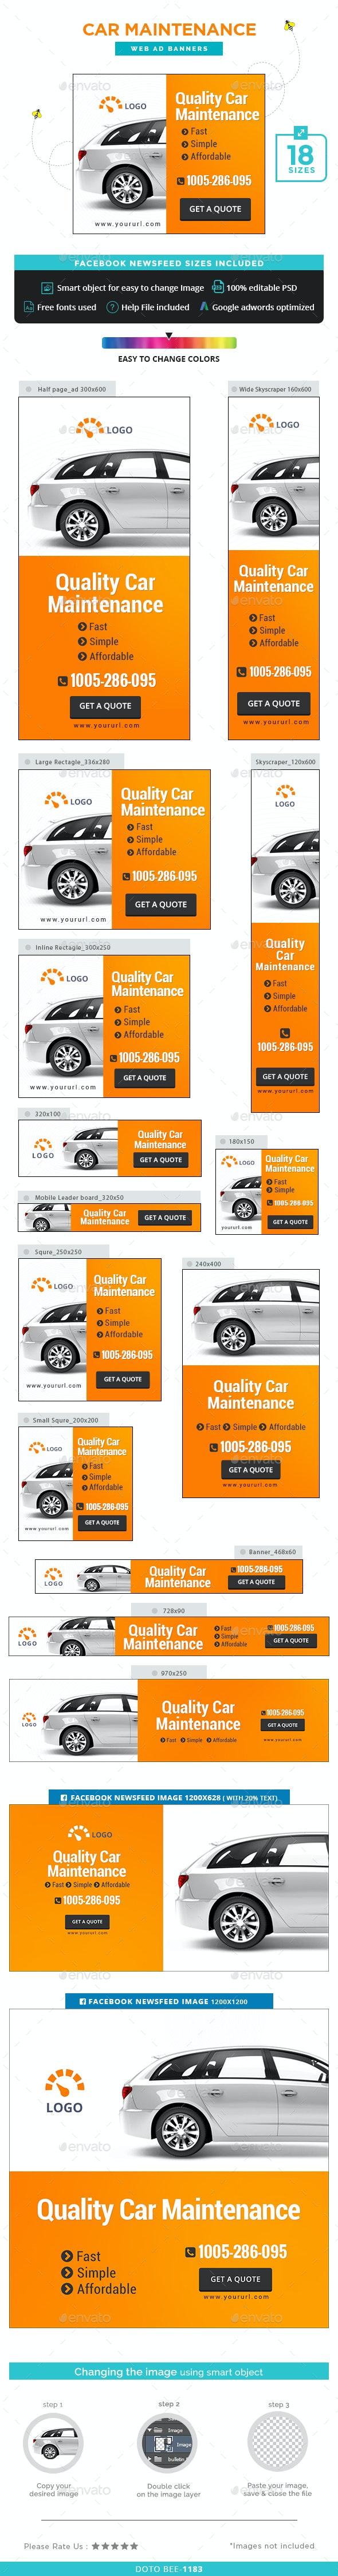 Car Maintenance Banners - Banners & Ads Web Elements